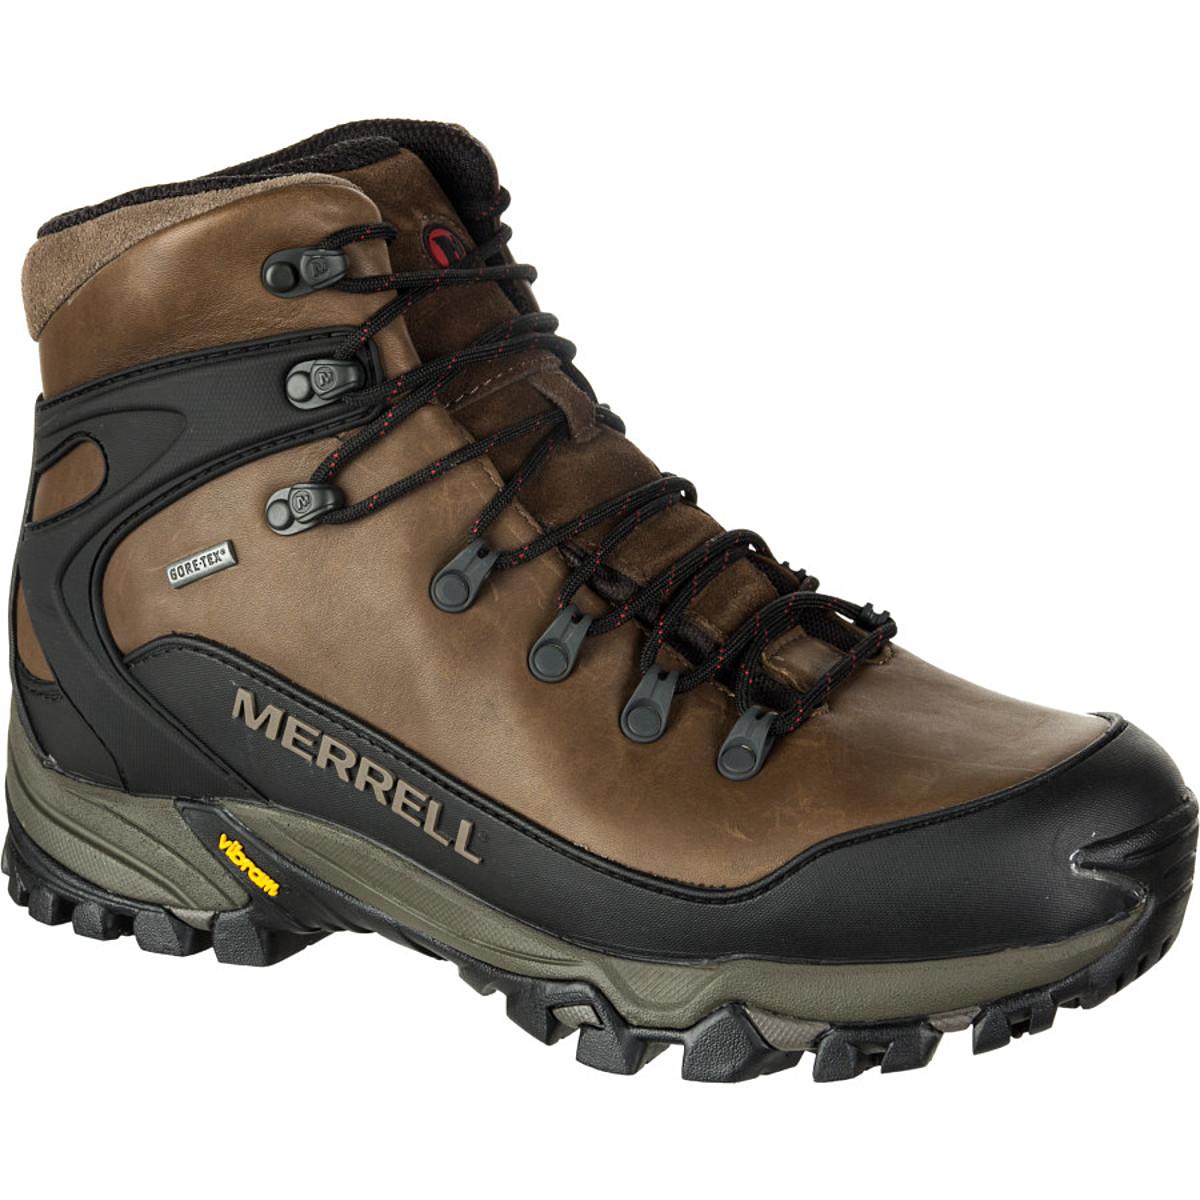 photo: Merrell Mattertal Gore-Tex hiking boot